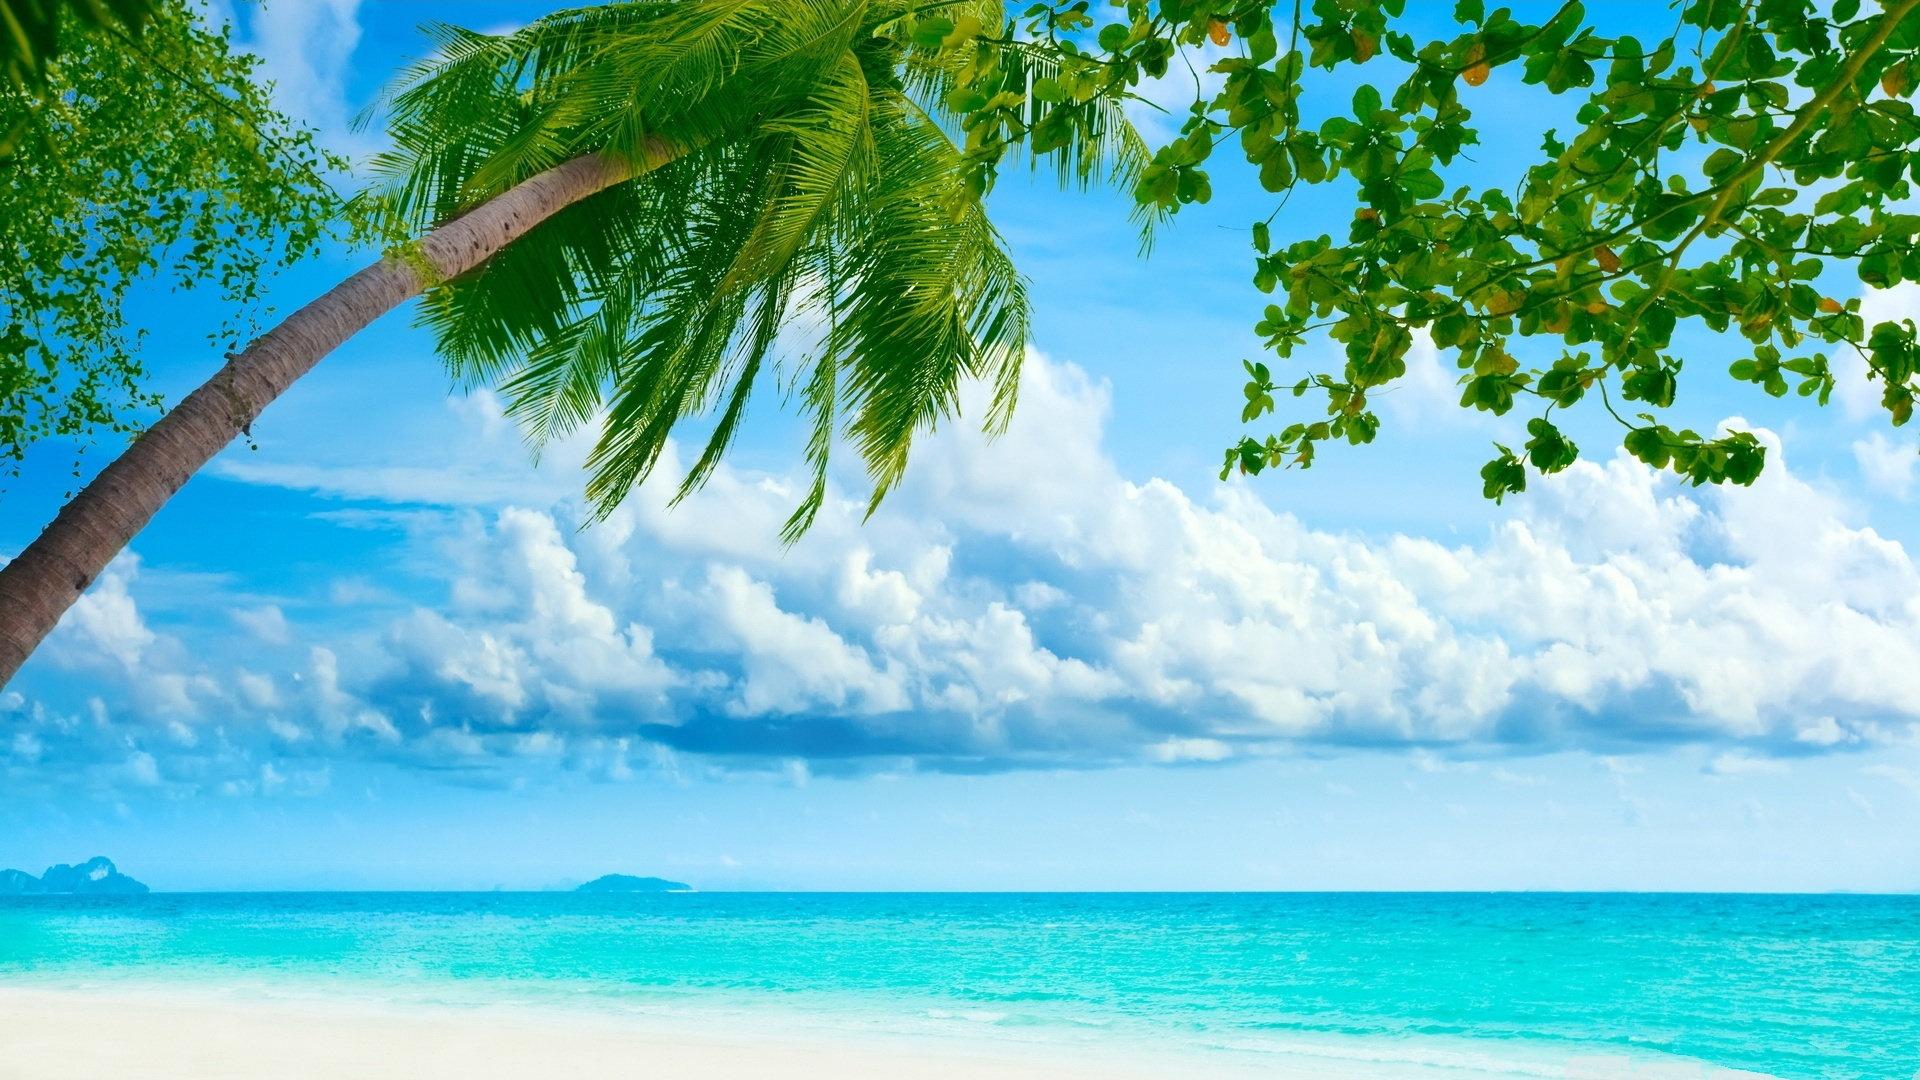 Tropical Island Desktop Wallpaper - 1920x1080